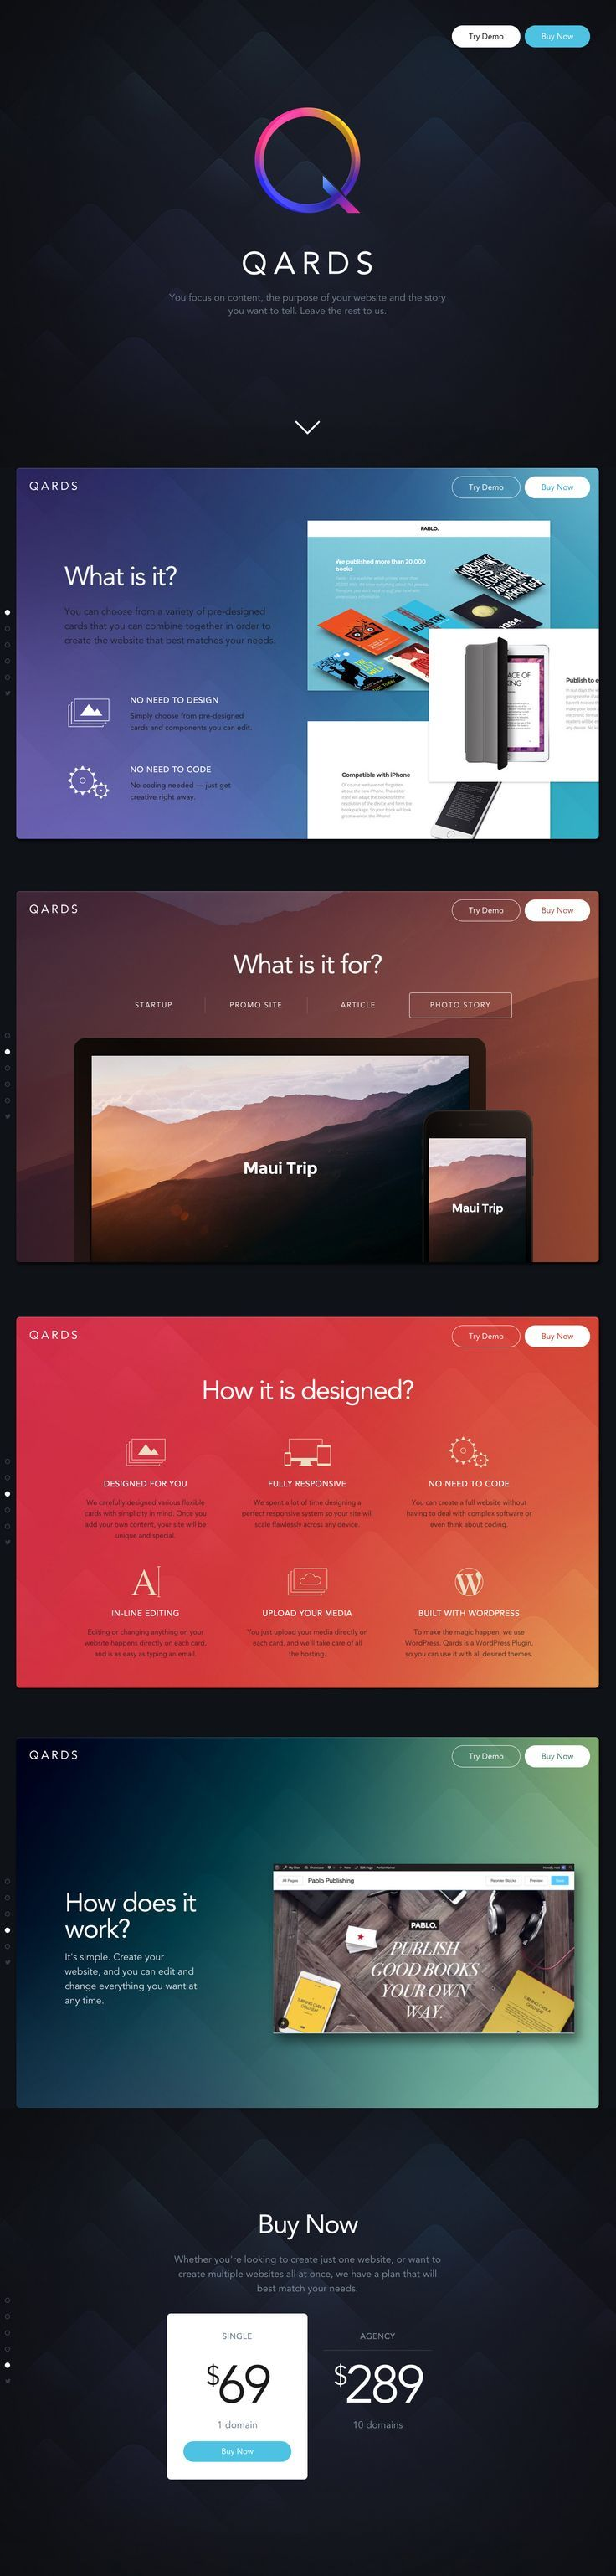 Modern & Trendy Web Designs